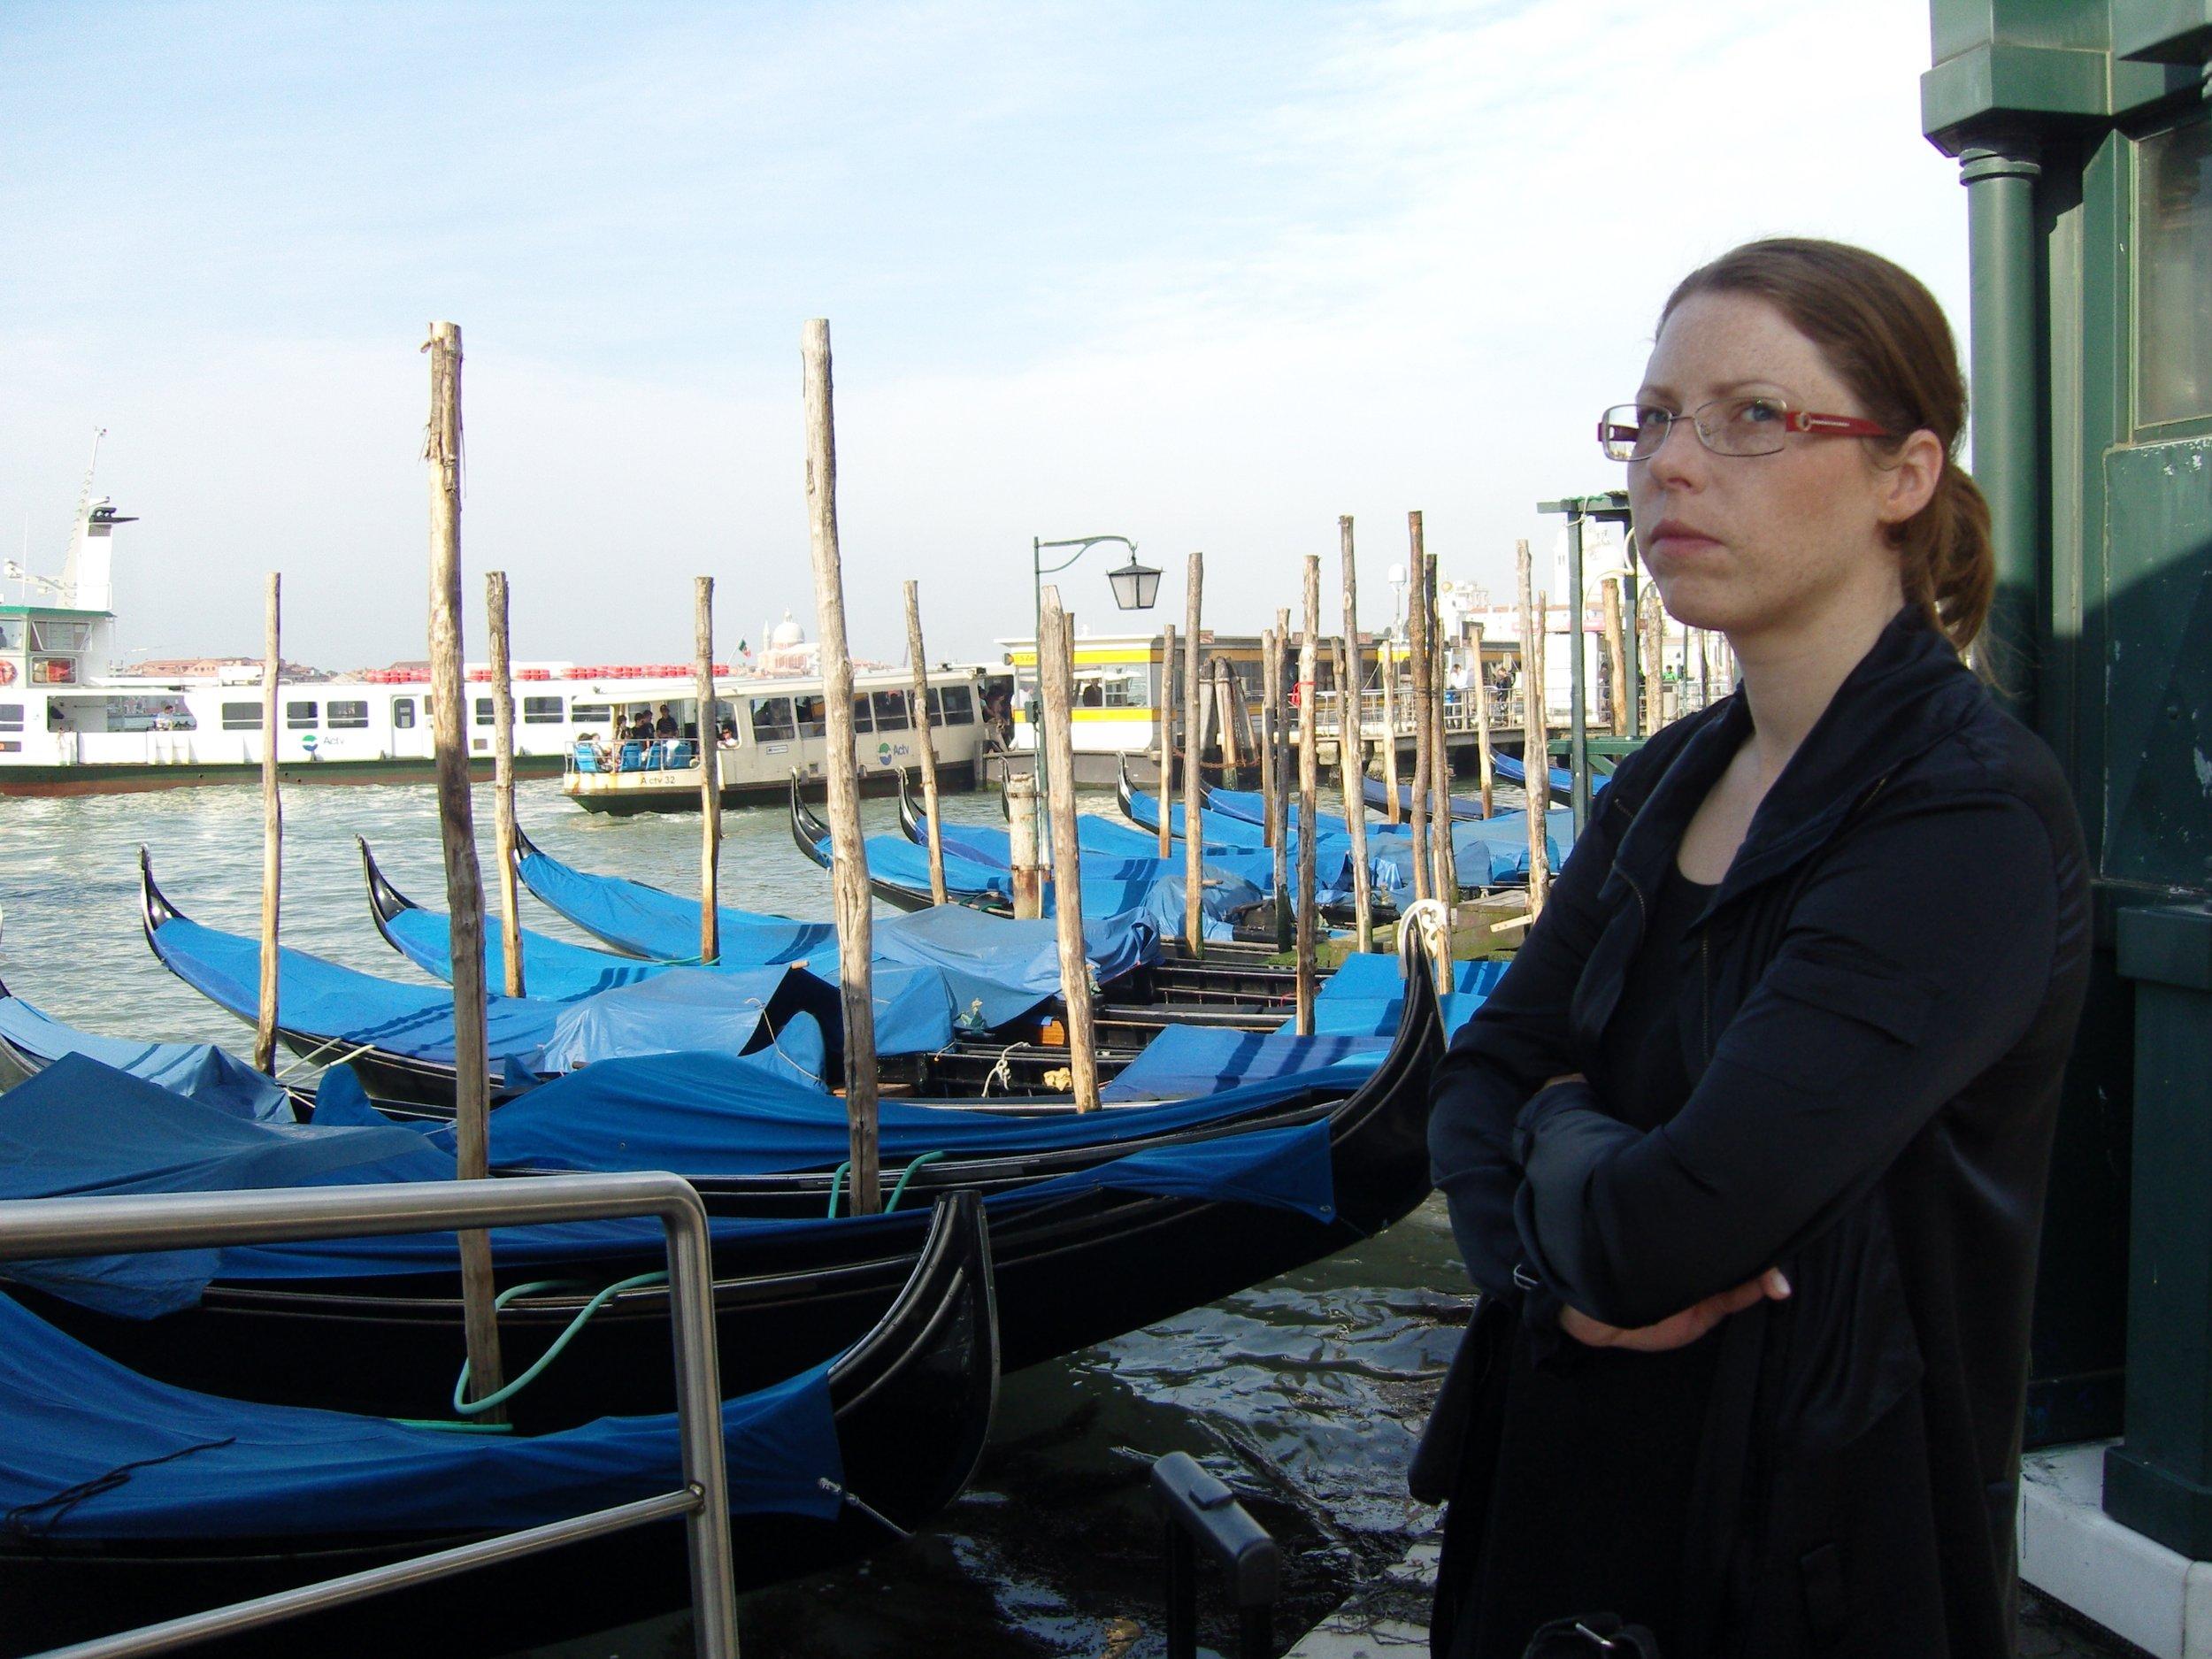 Art critic trying to define the Scandinavian pain while waiting for her water taxi. Photo: © Zenta Dzividzinska.